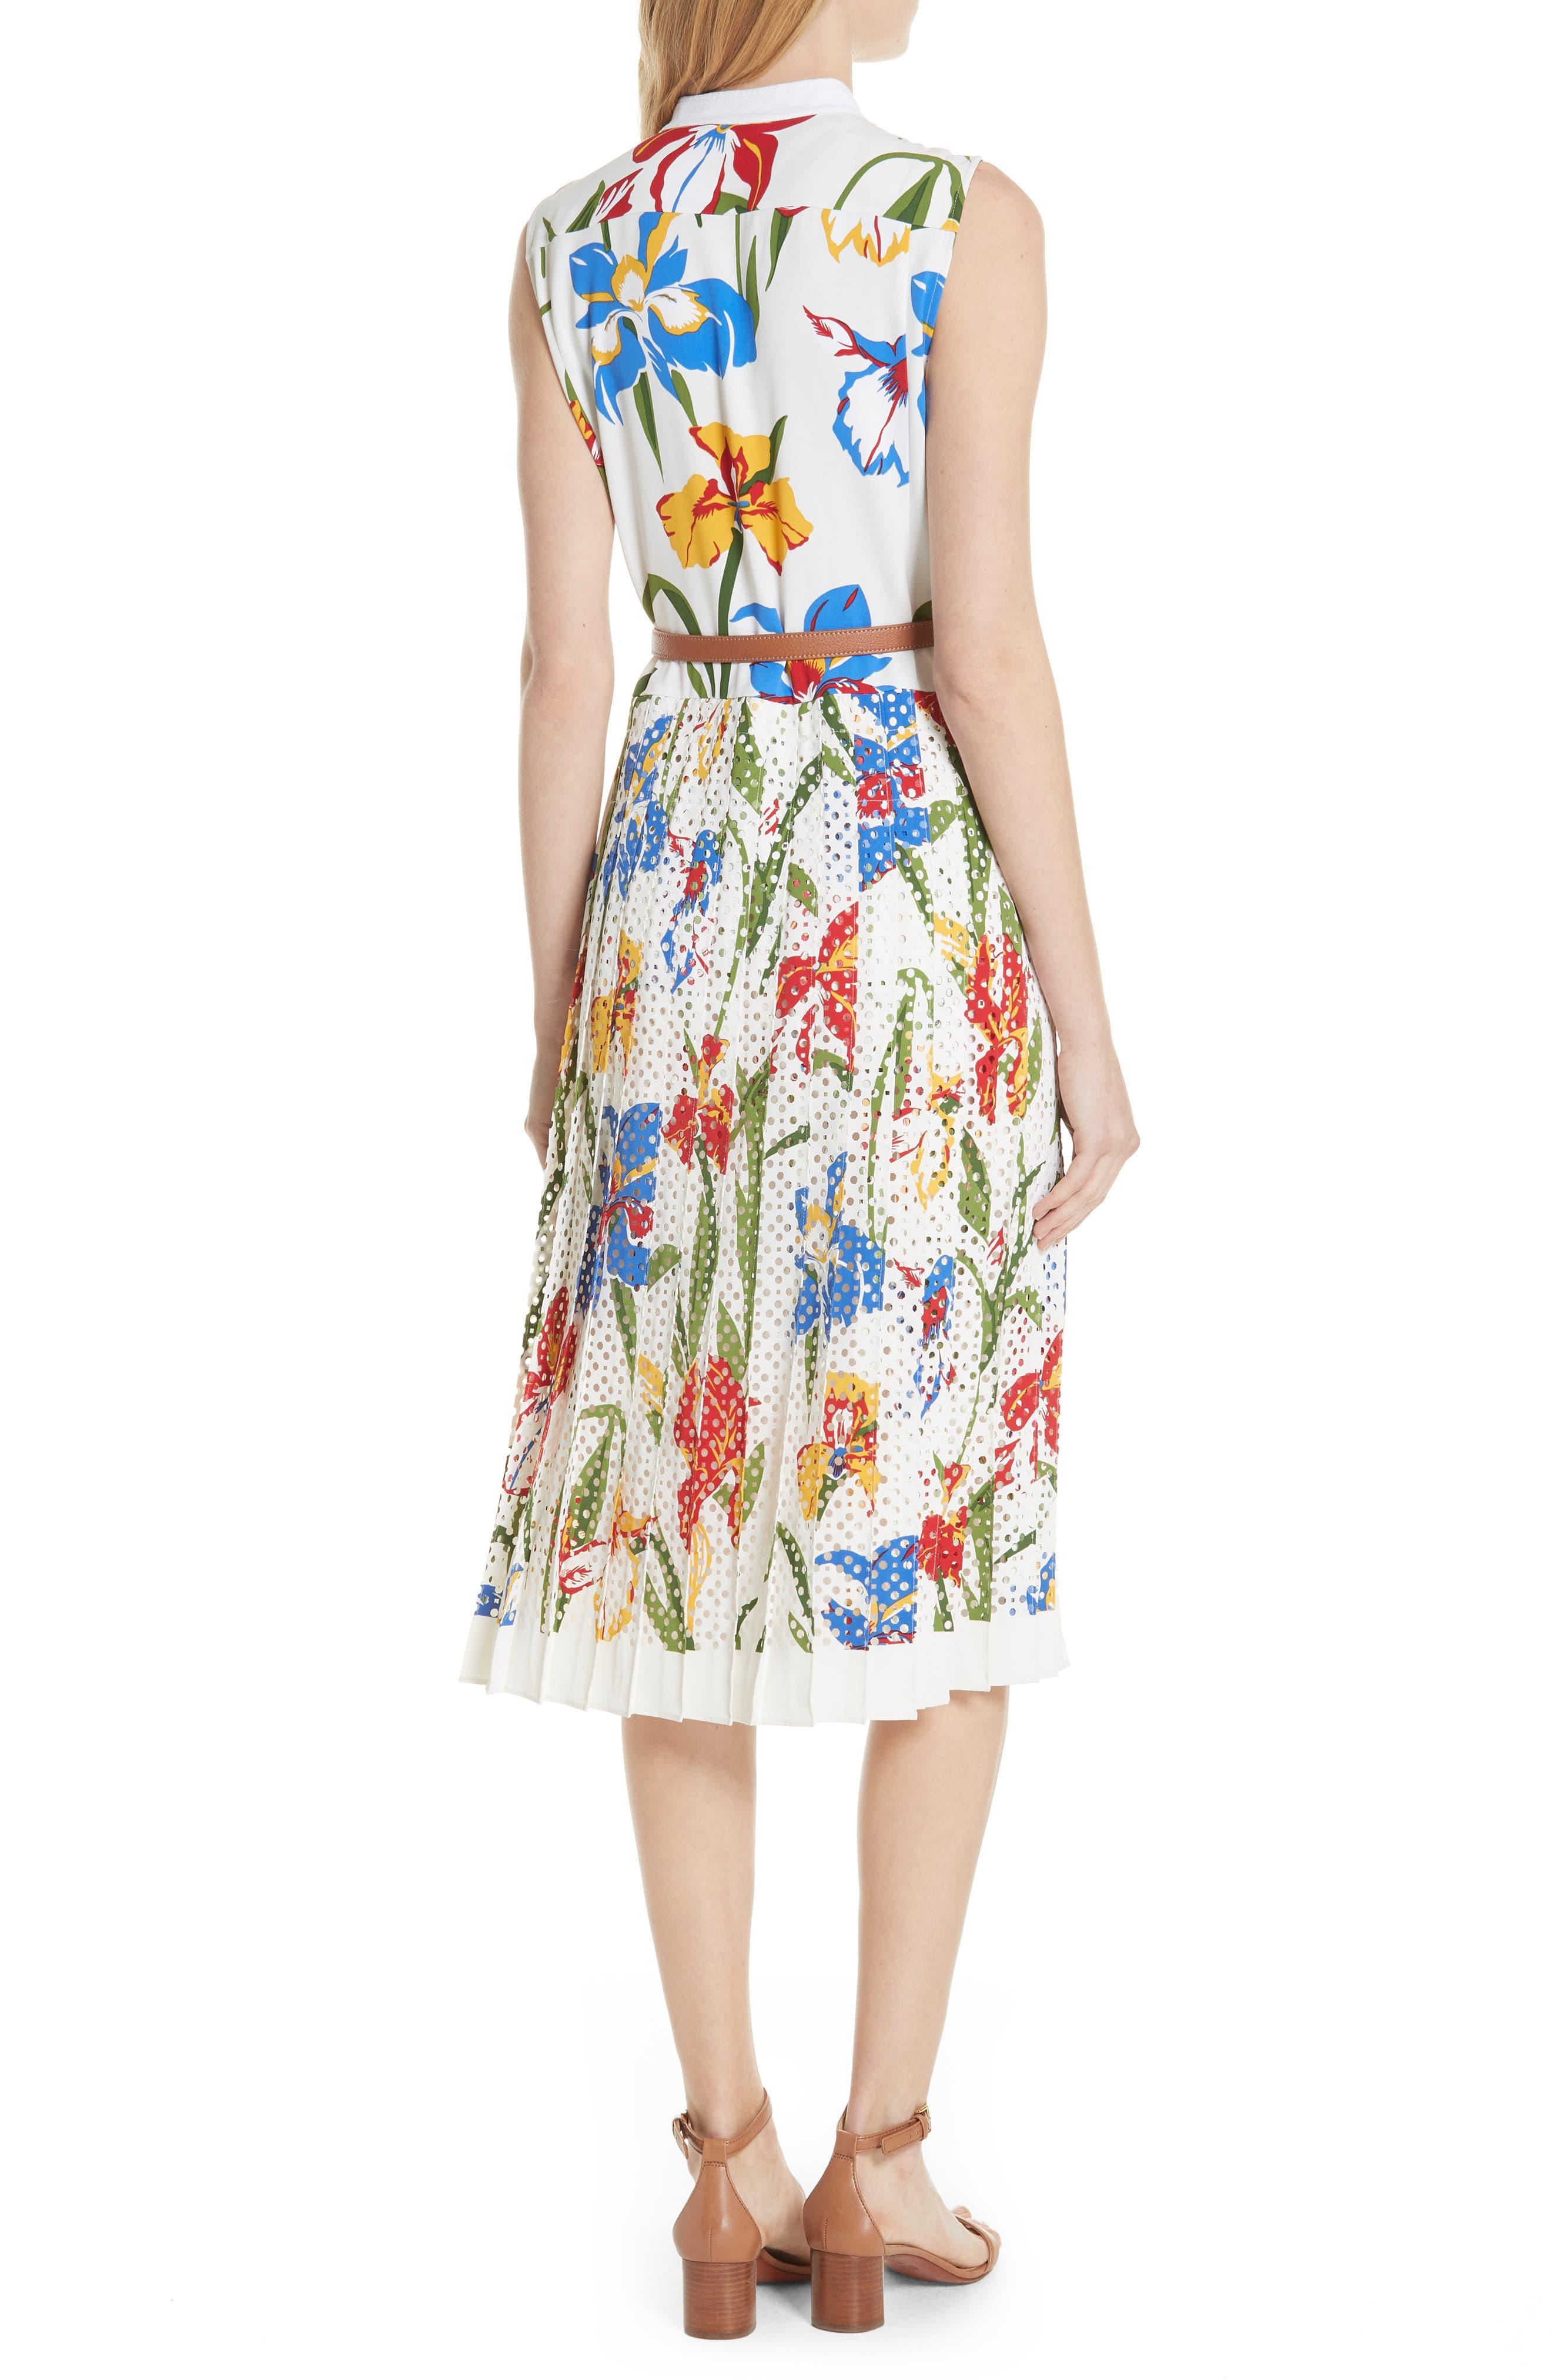 Carine Floral Dress,                             Alternate thumbnail 2, color,                             Painted Iris